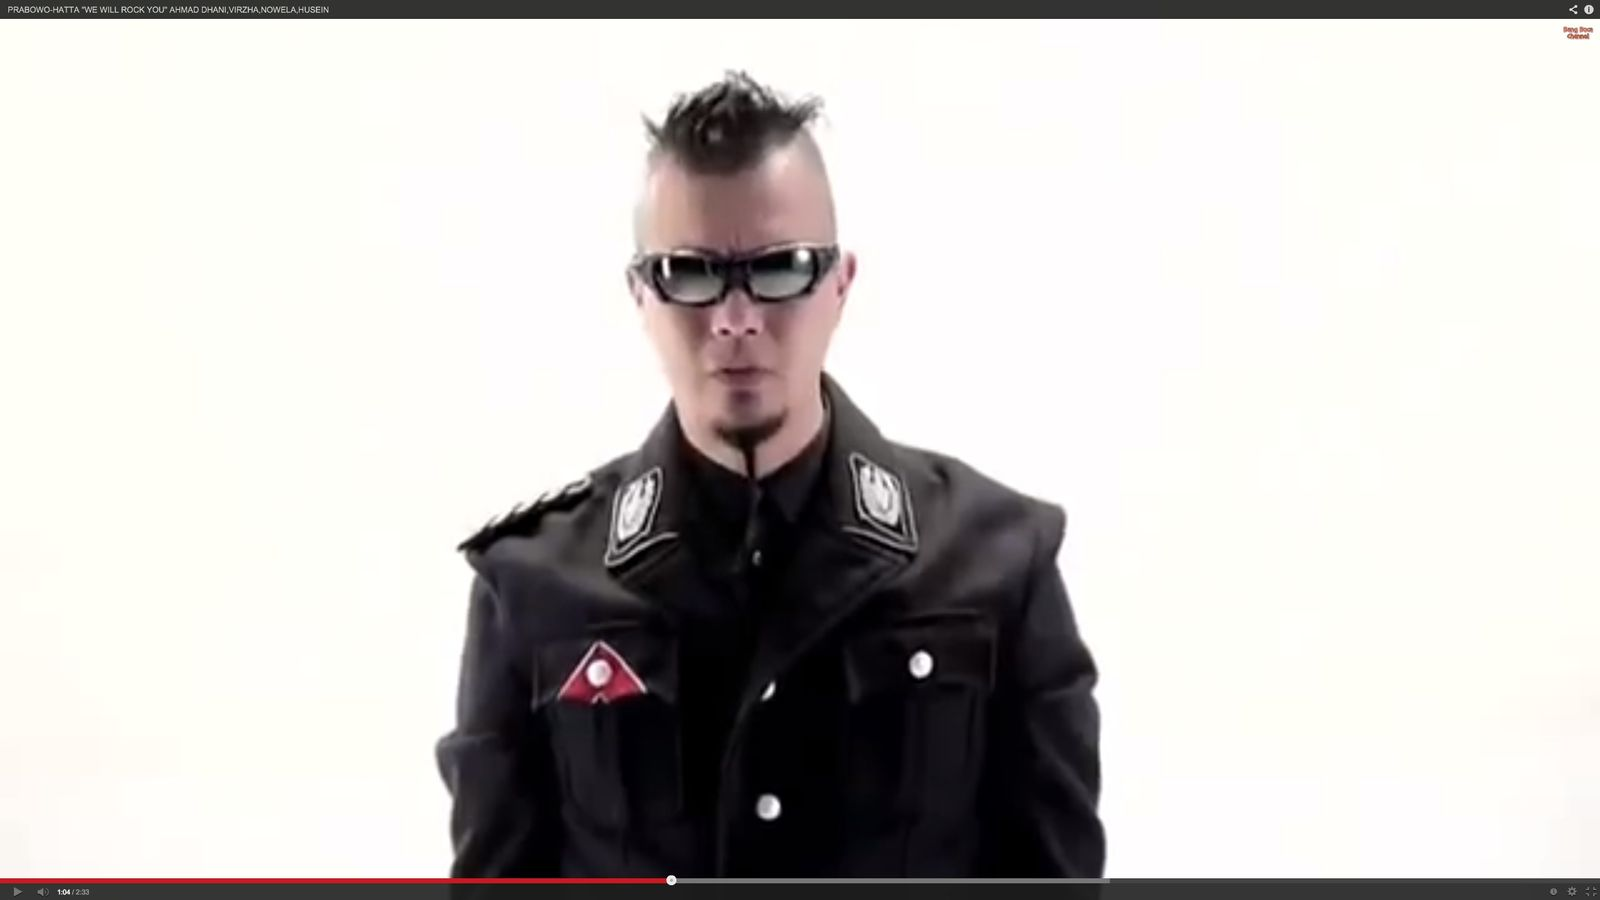 NUR ALS ZITAT Wahlkampfvideo Indonesien Himmler-Uniform